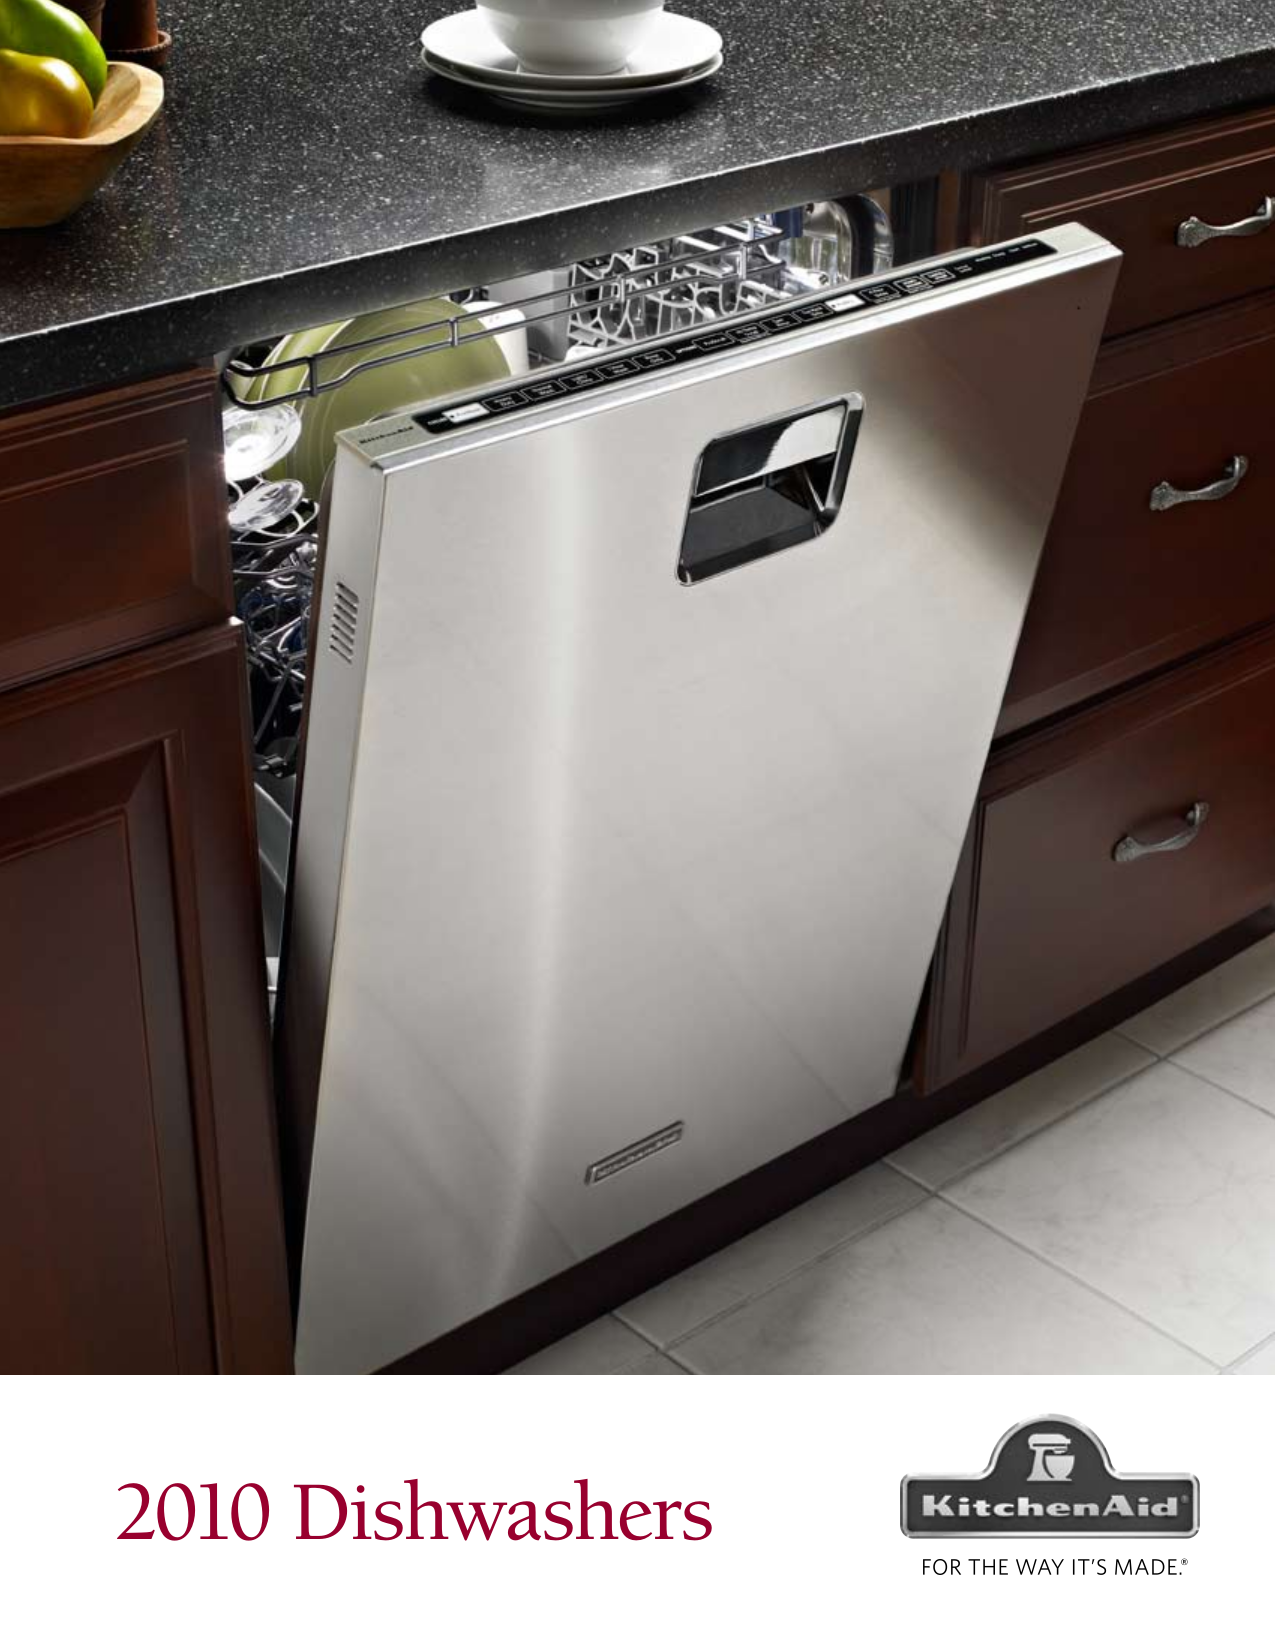 Kitchenaid Dishwasher Manual 577 0 - Kitchen Design